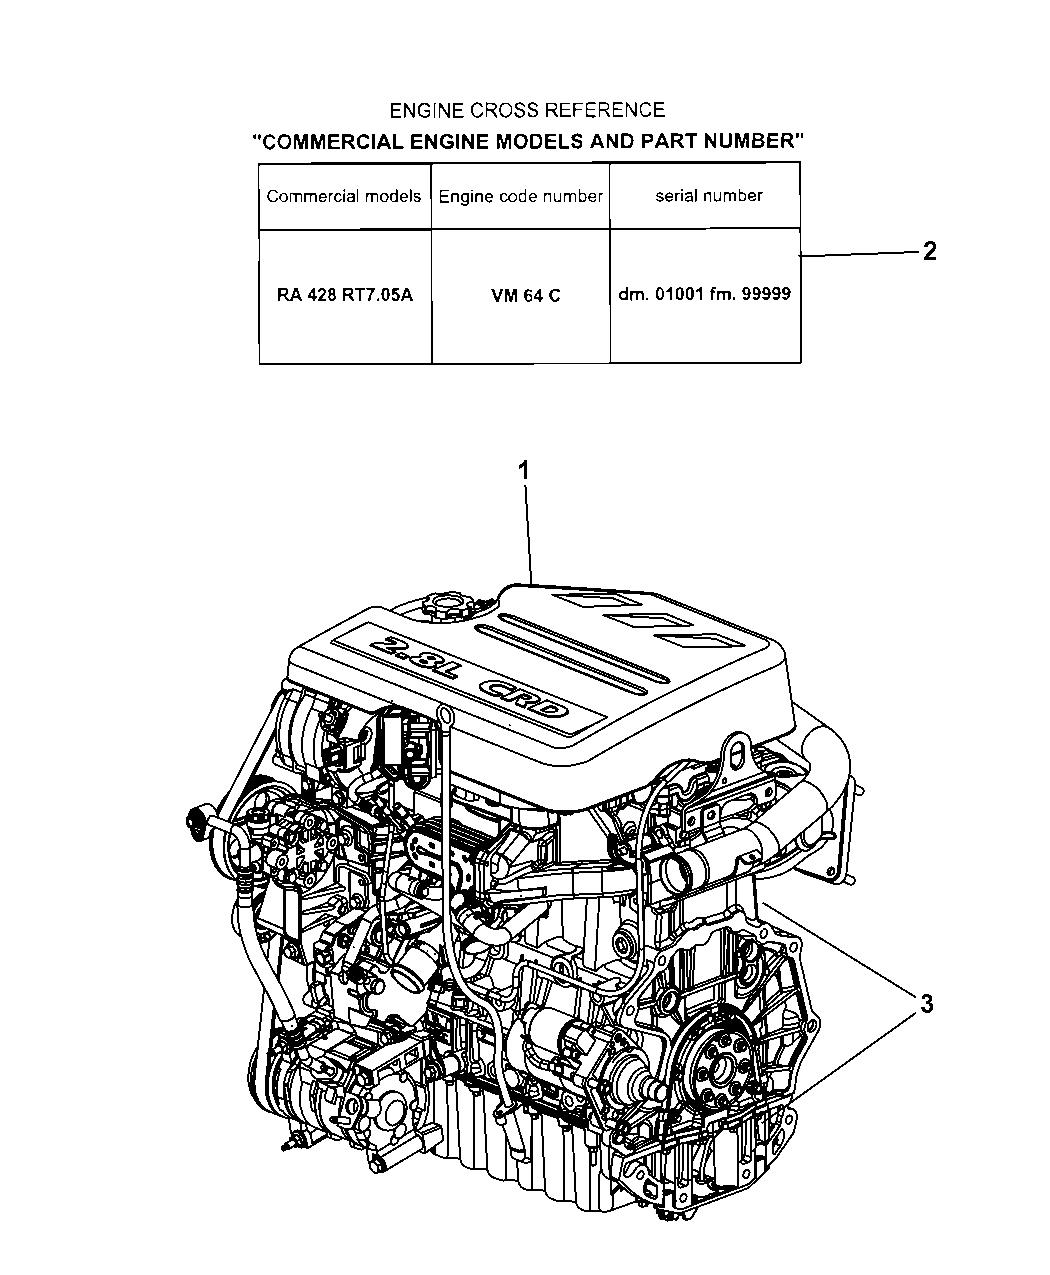 2009 Jeep Wrangler Engine Assembly & Service - Thumbnail 1